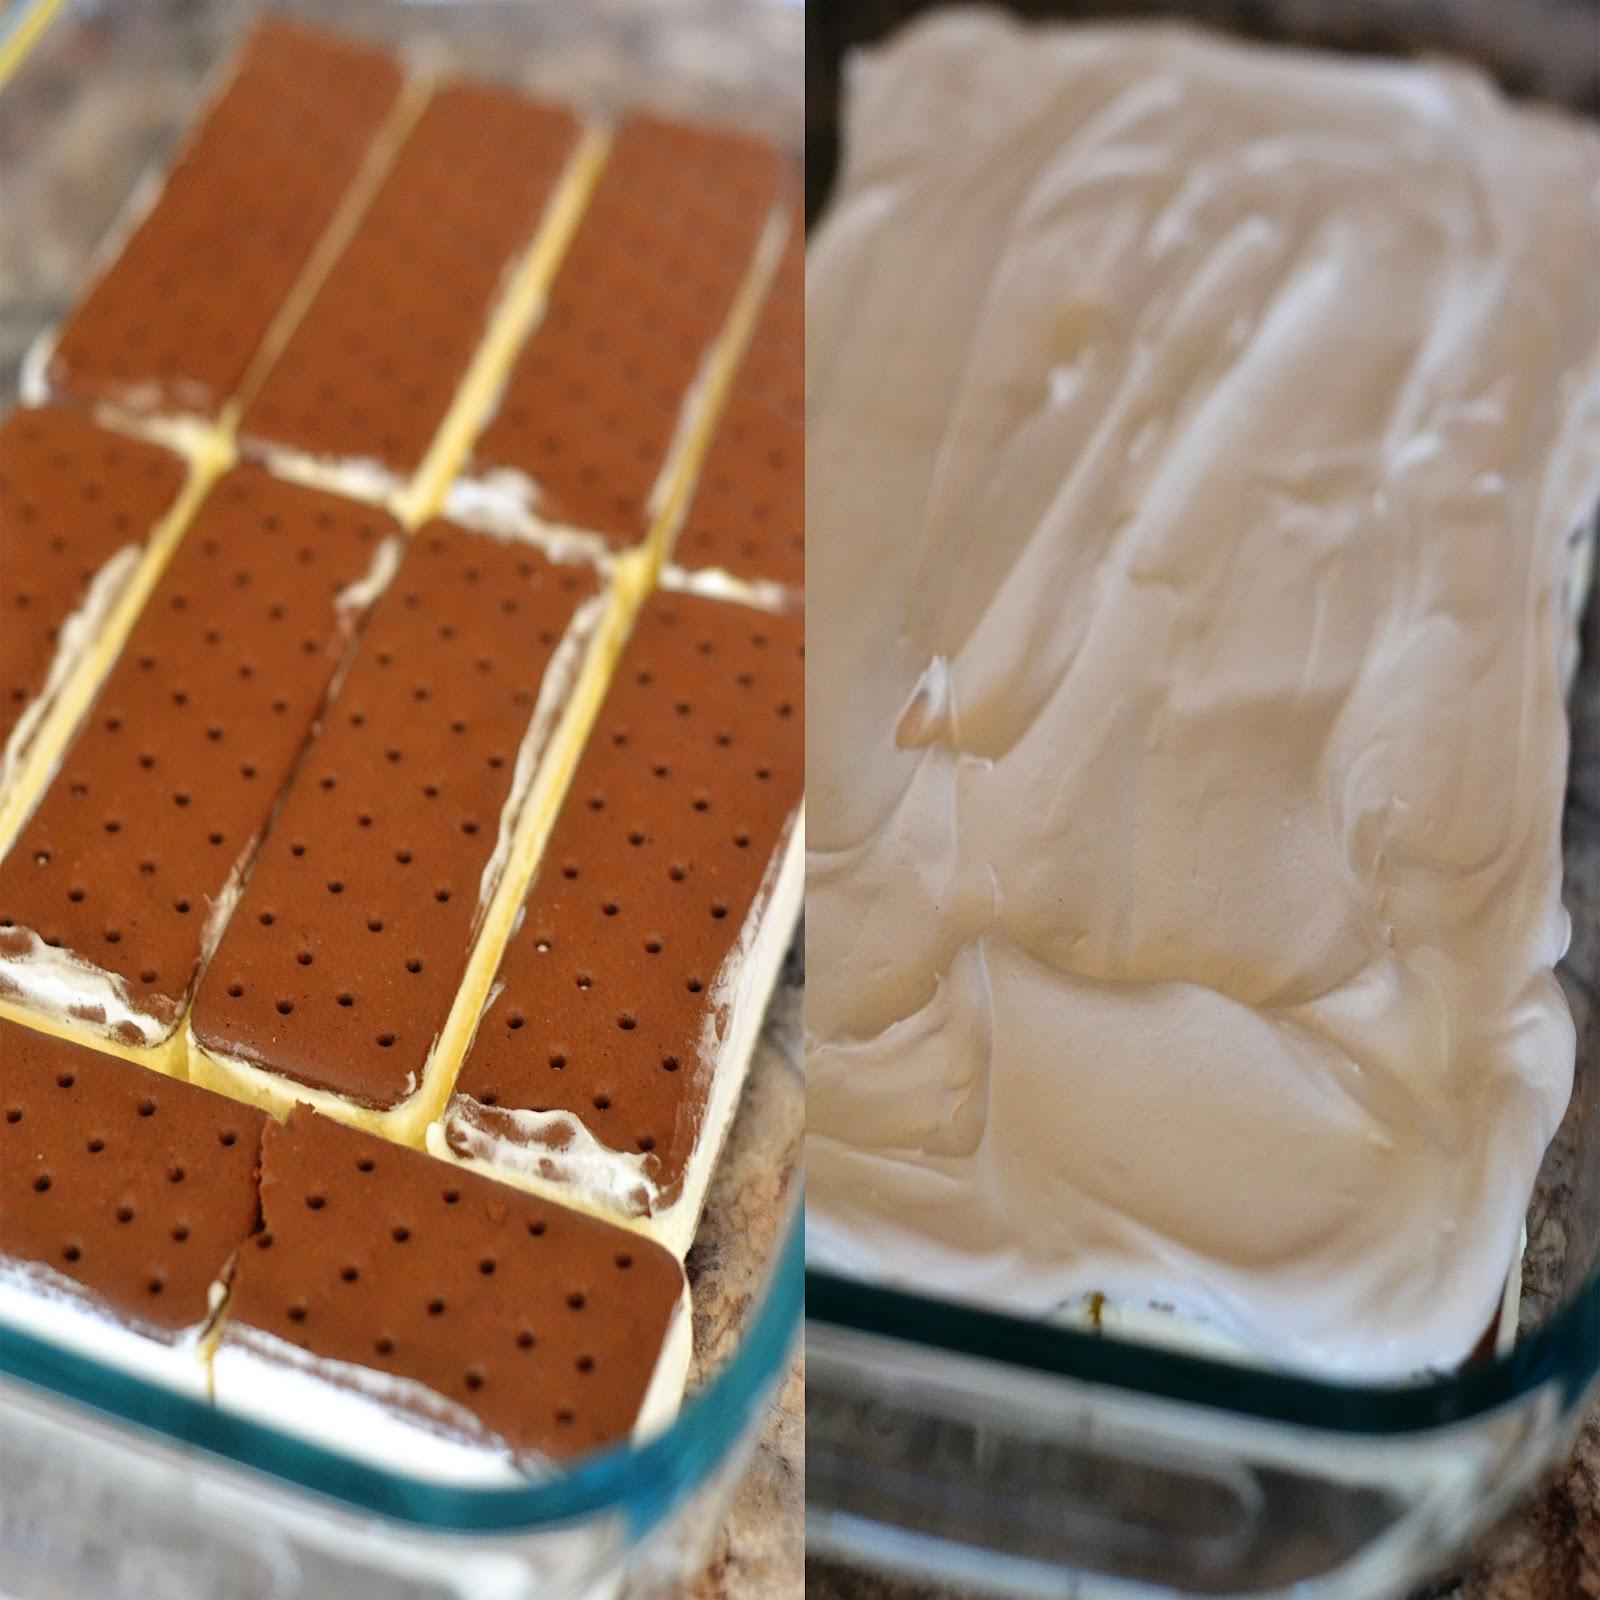 Banana Pound Cake With Chocolate Sauce